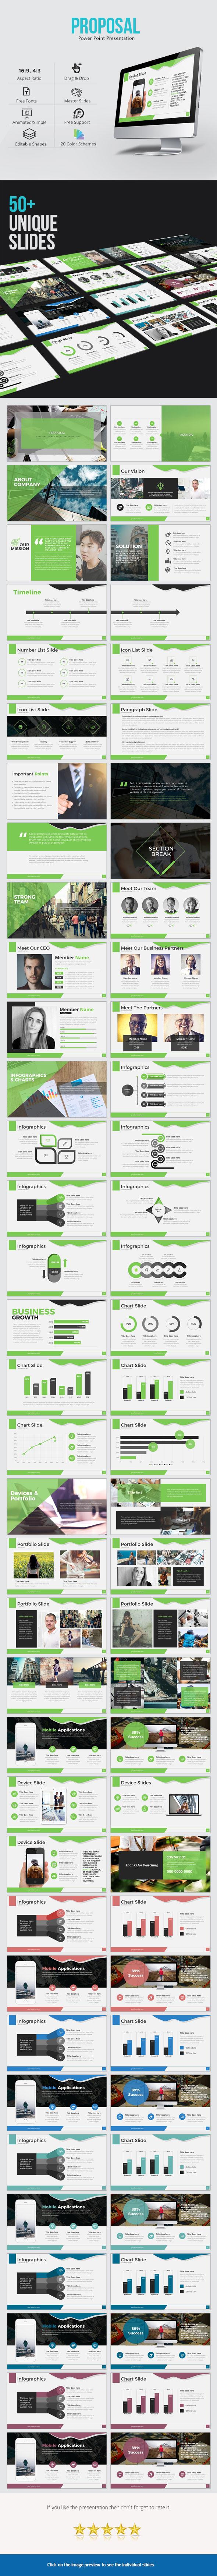 GraphicRiver Proposal Power Point Presentation 21124880